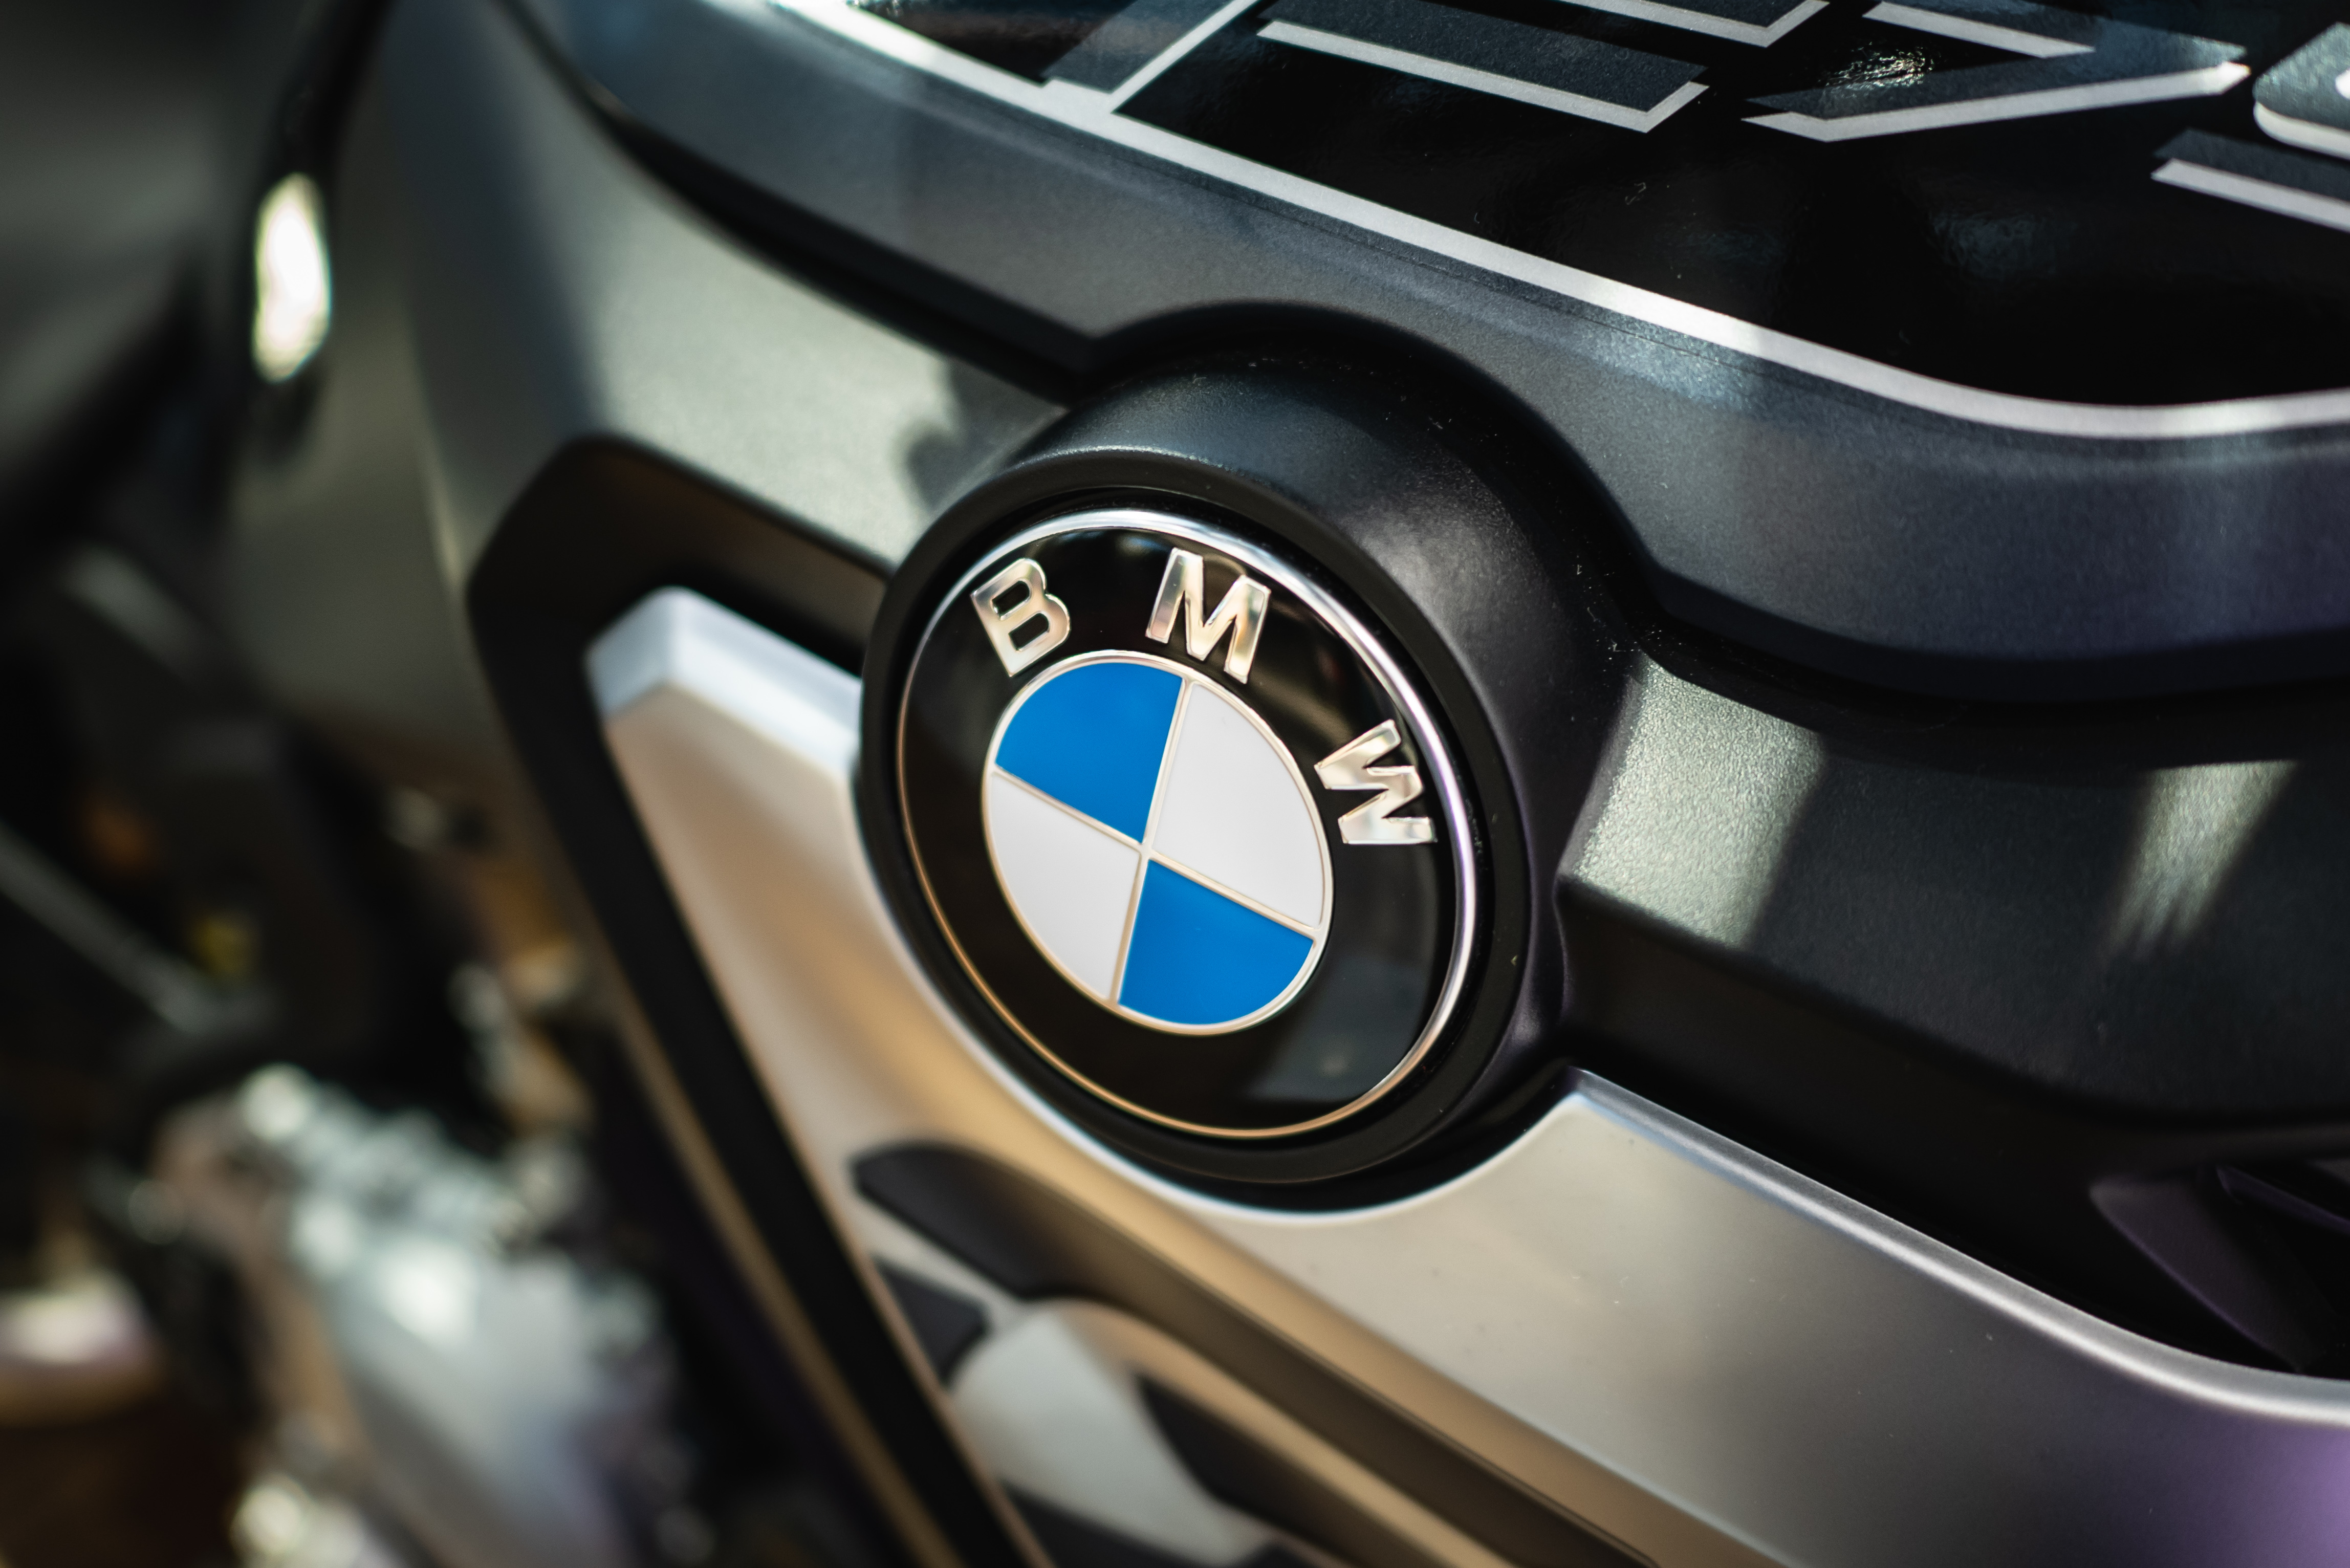 2020 Used BMW SUV Performance